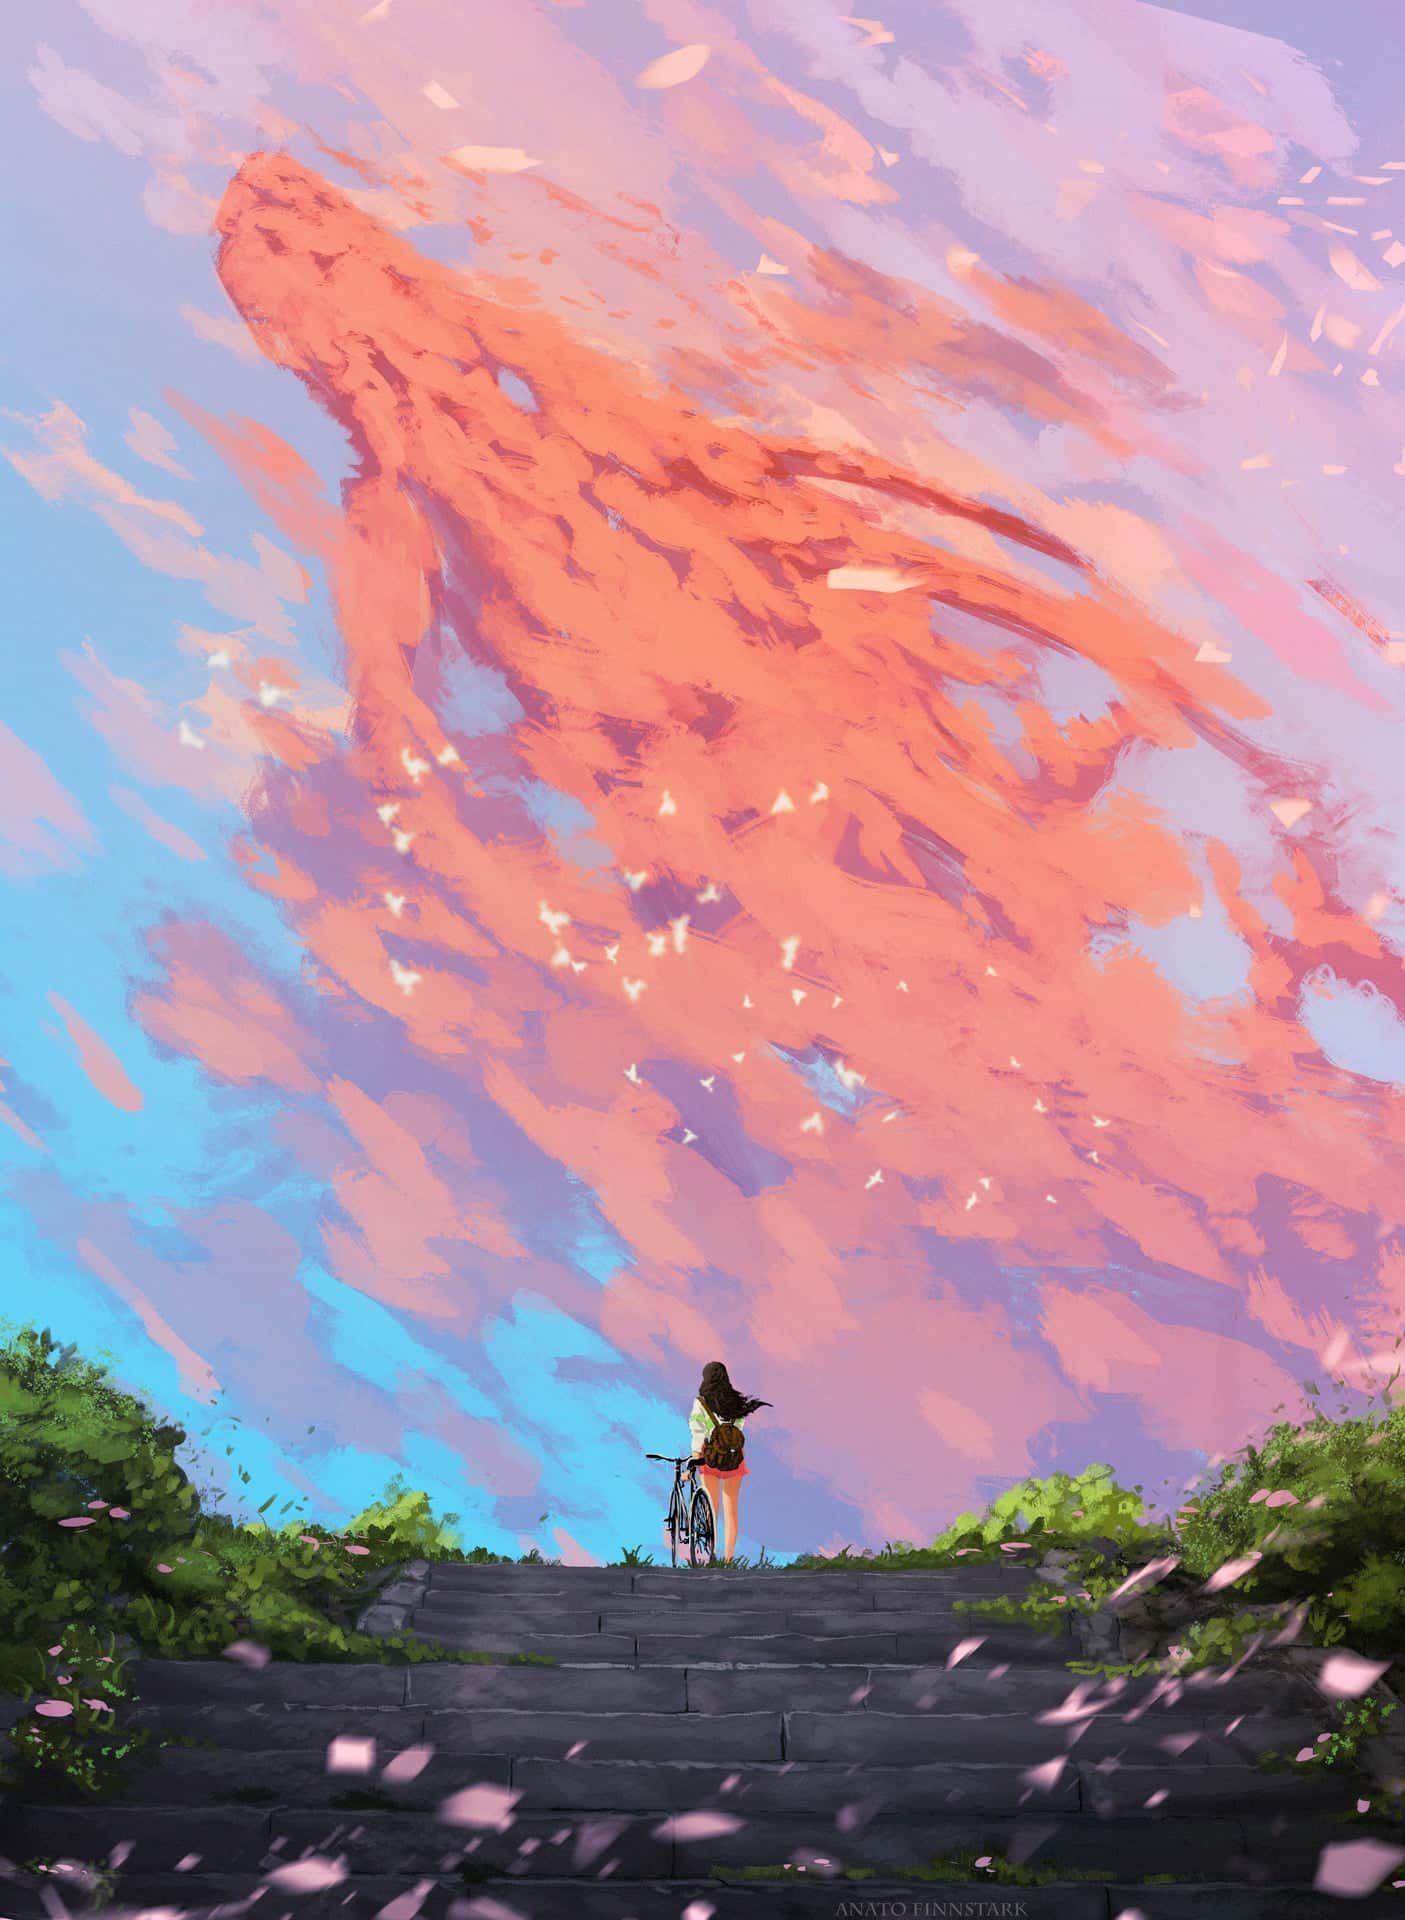 Anato Finnstark On Twitter Studio Ghibli Background Spirited Away Wallpaper Studio Ghibli Spirited Away